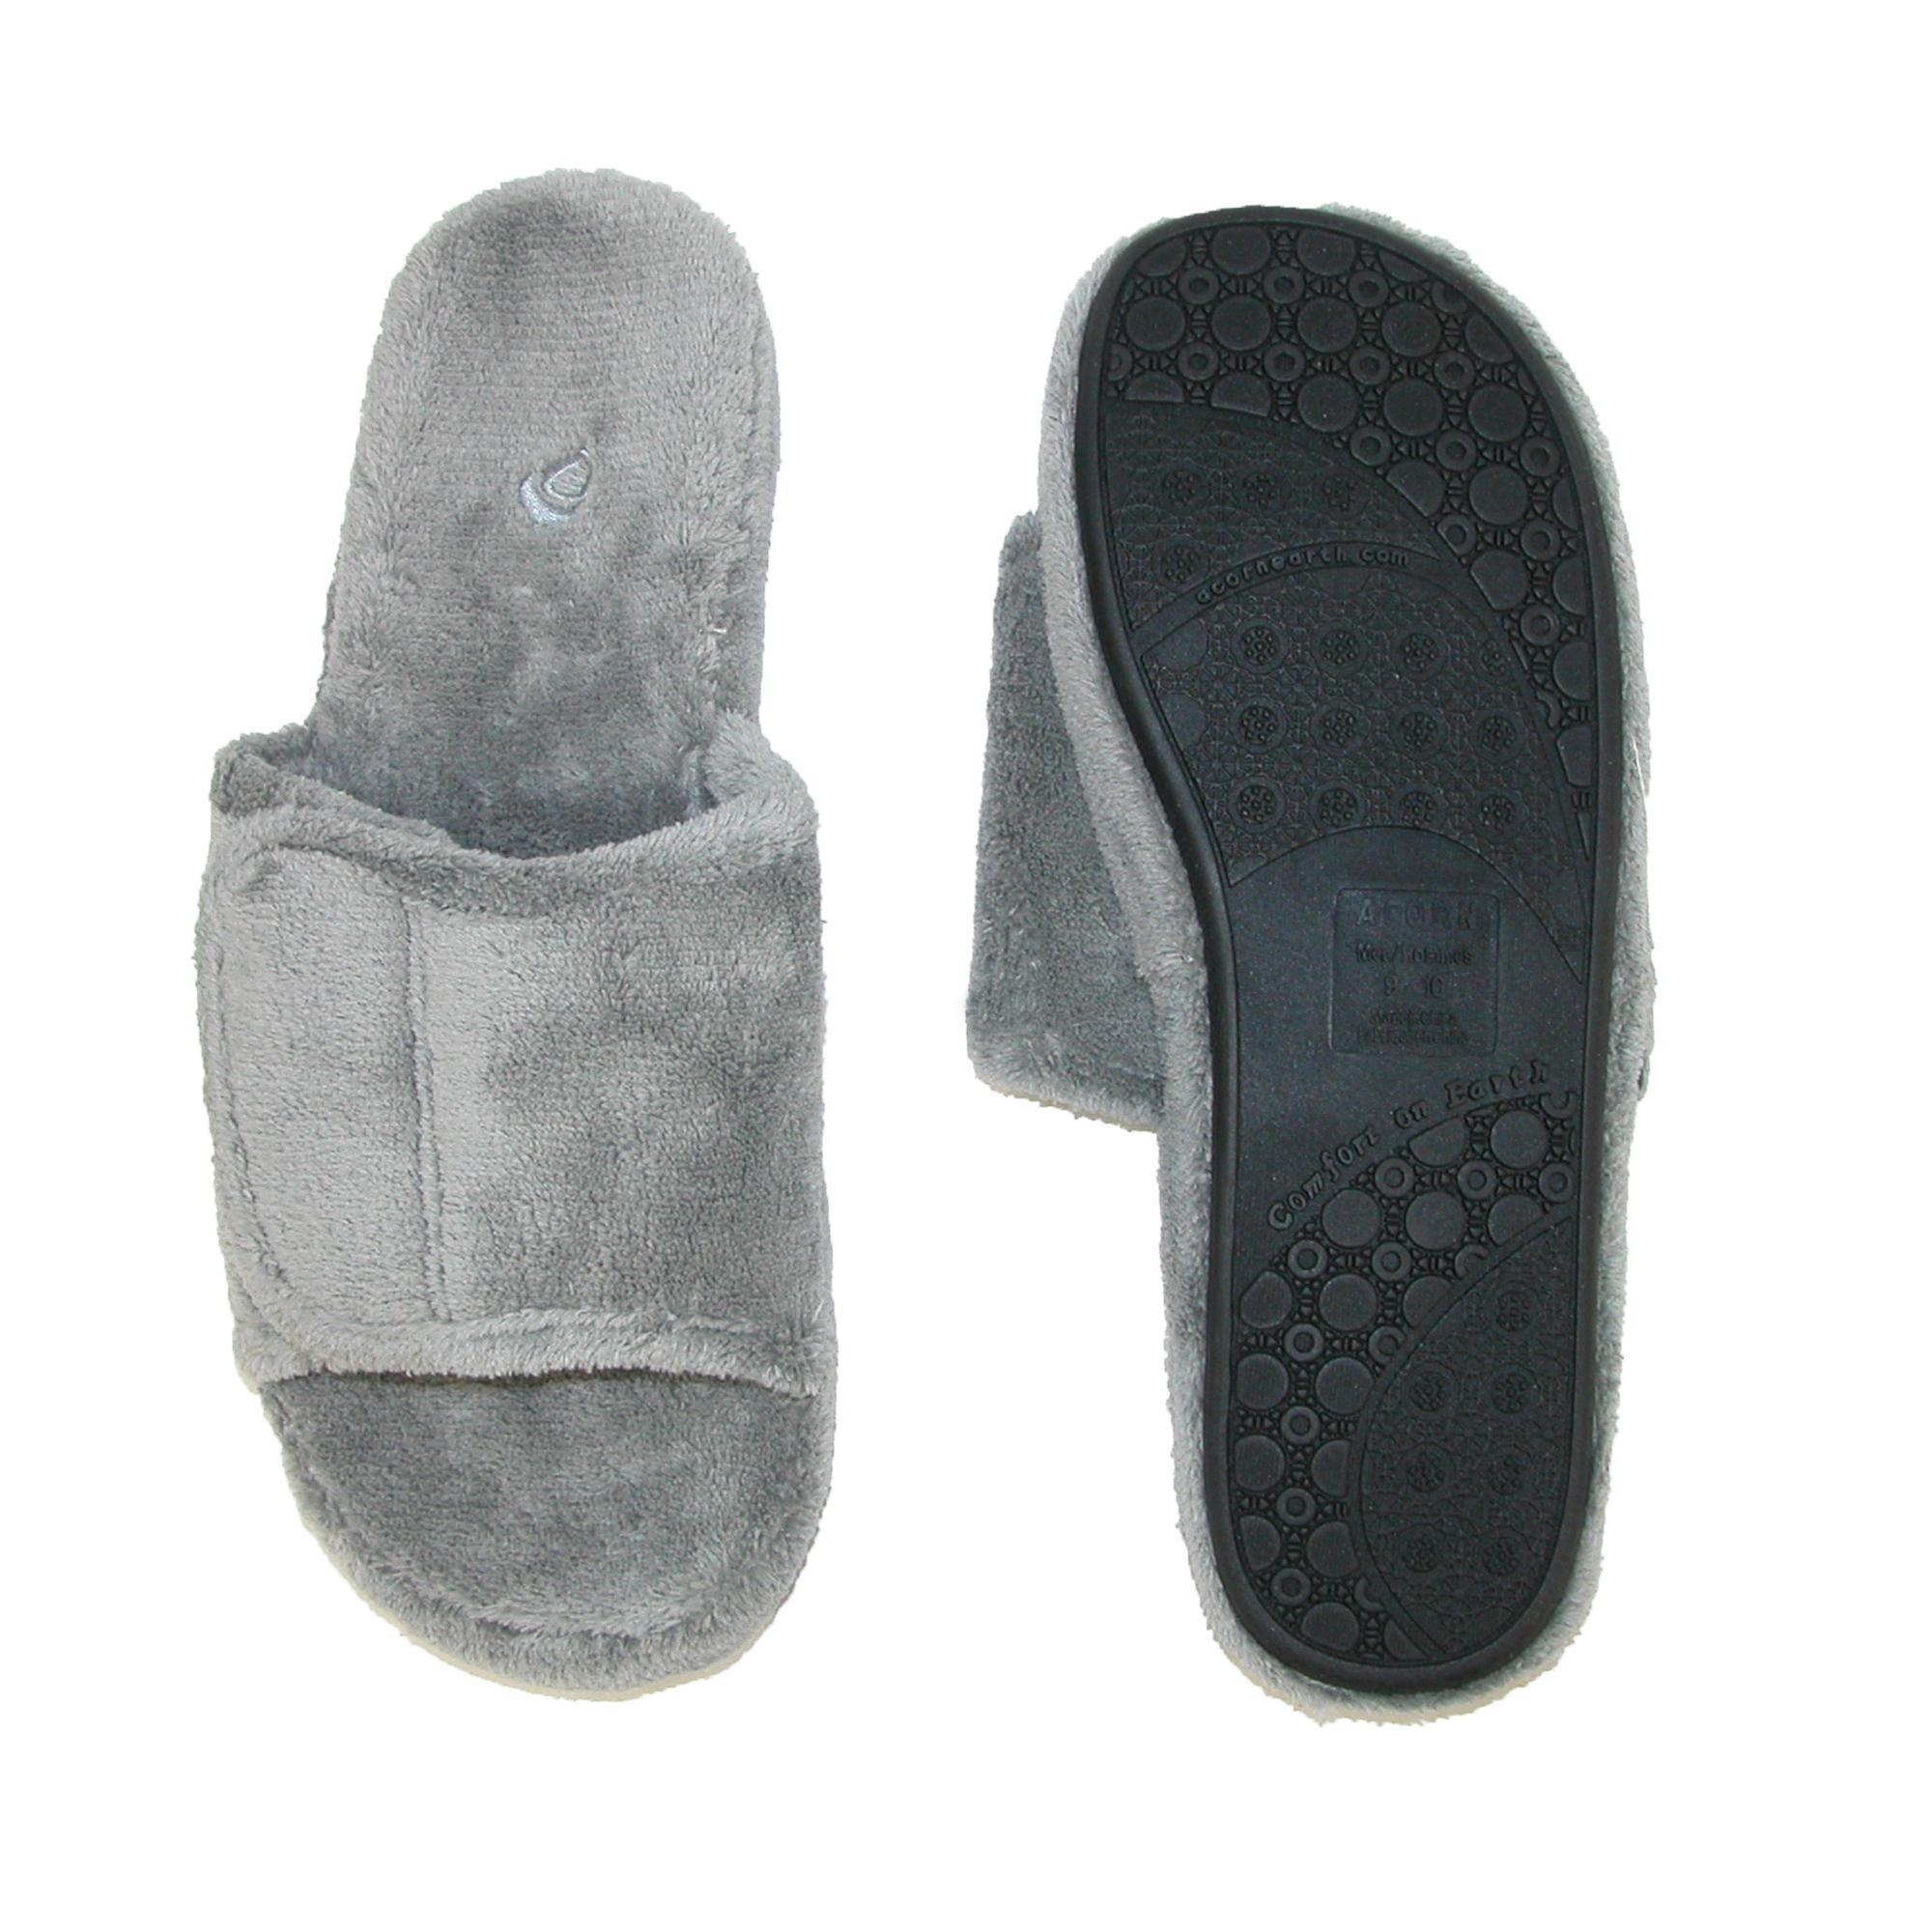 157e241aca8 Shop Acorn Men s Spa Slide Slippers - Free Shipping On Orders Over  45 -  Overstock - 14345099